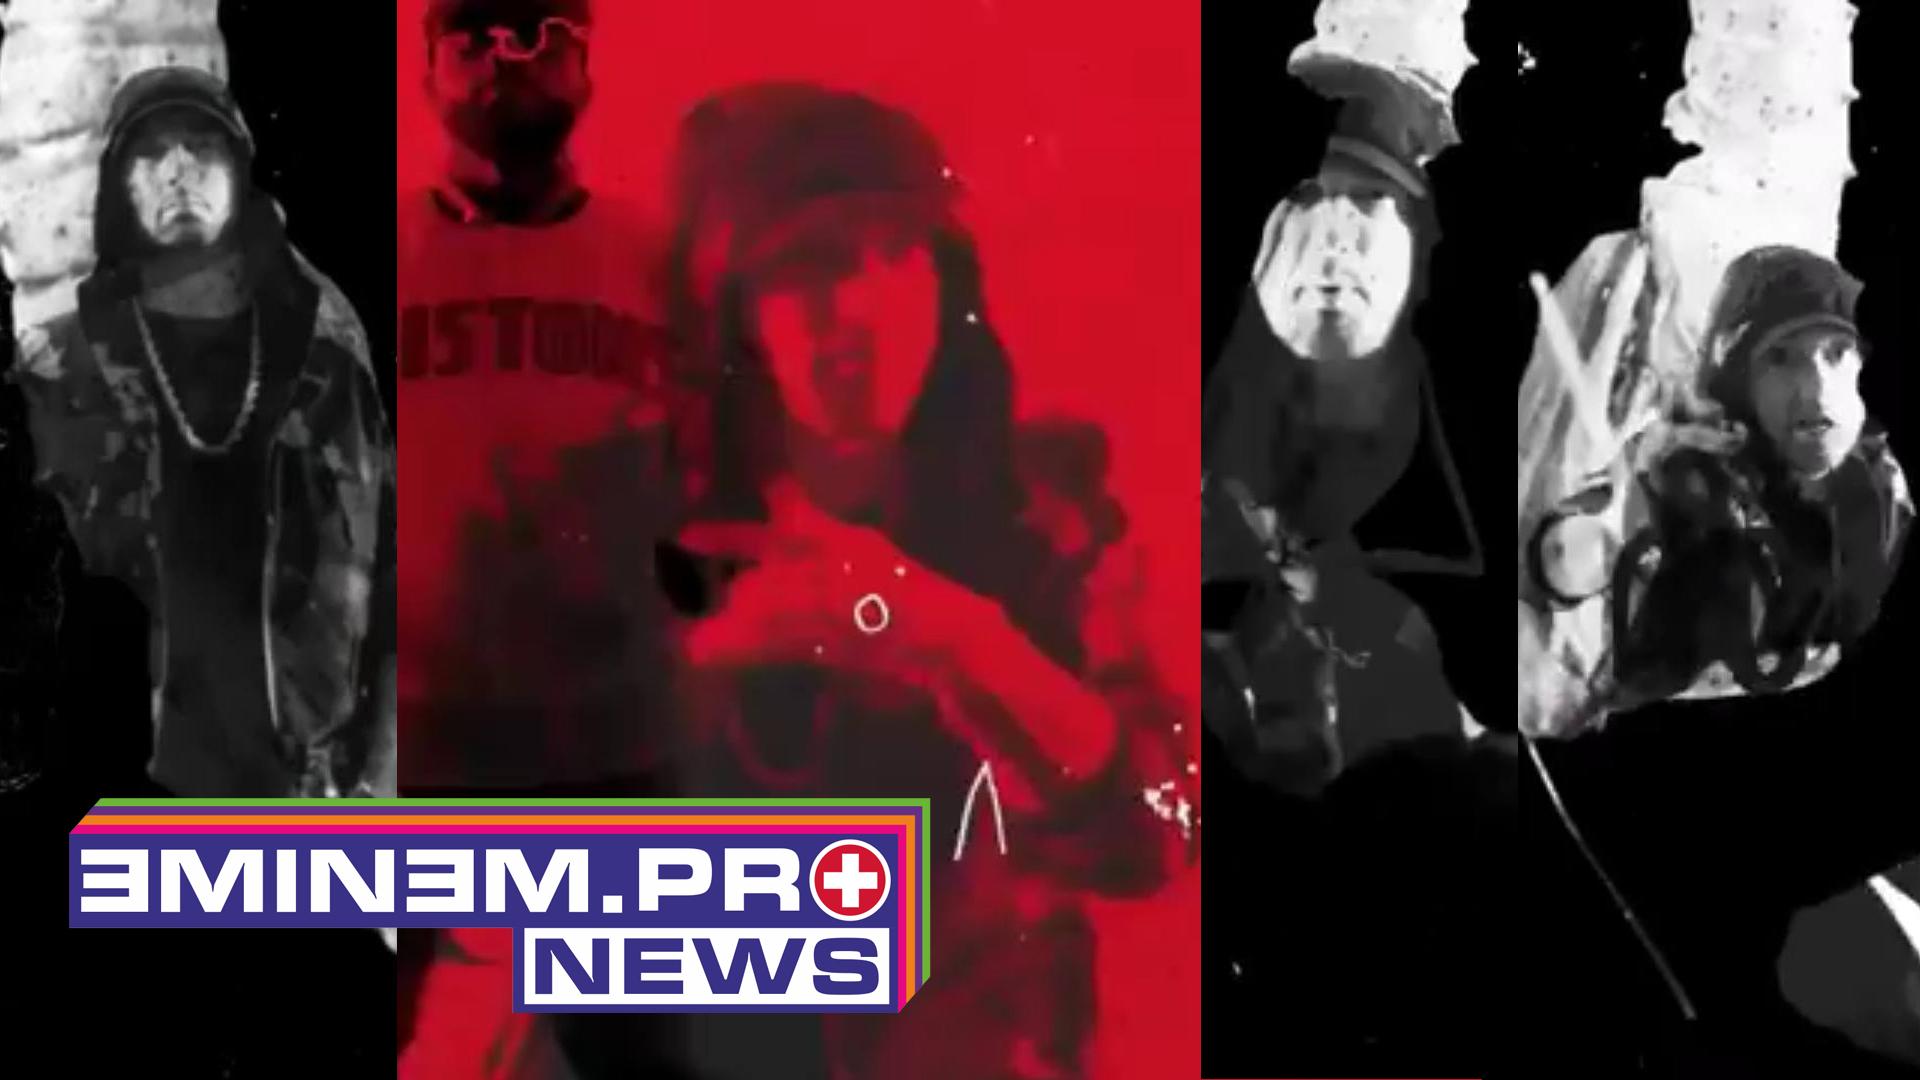 Watch Caterpillar Music Video Teaser (Royce 5'9 ft. Eminem). Premiere: 3PM EST Tomorrow